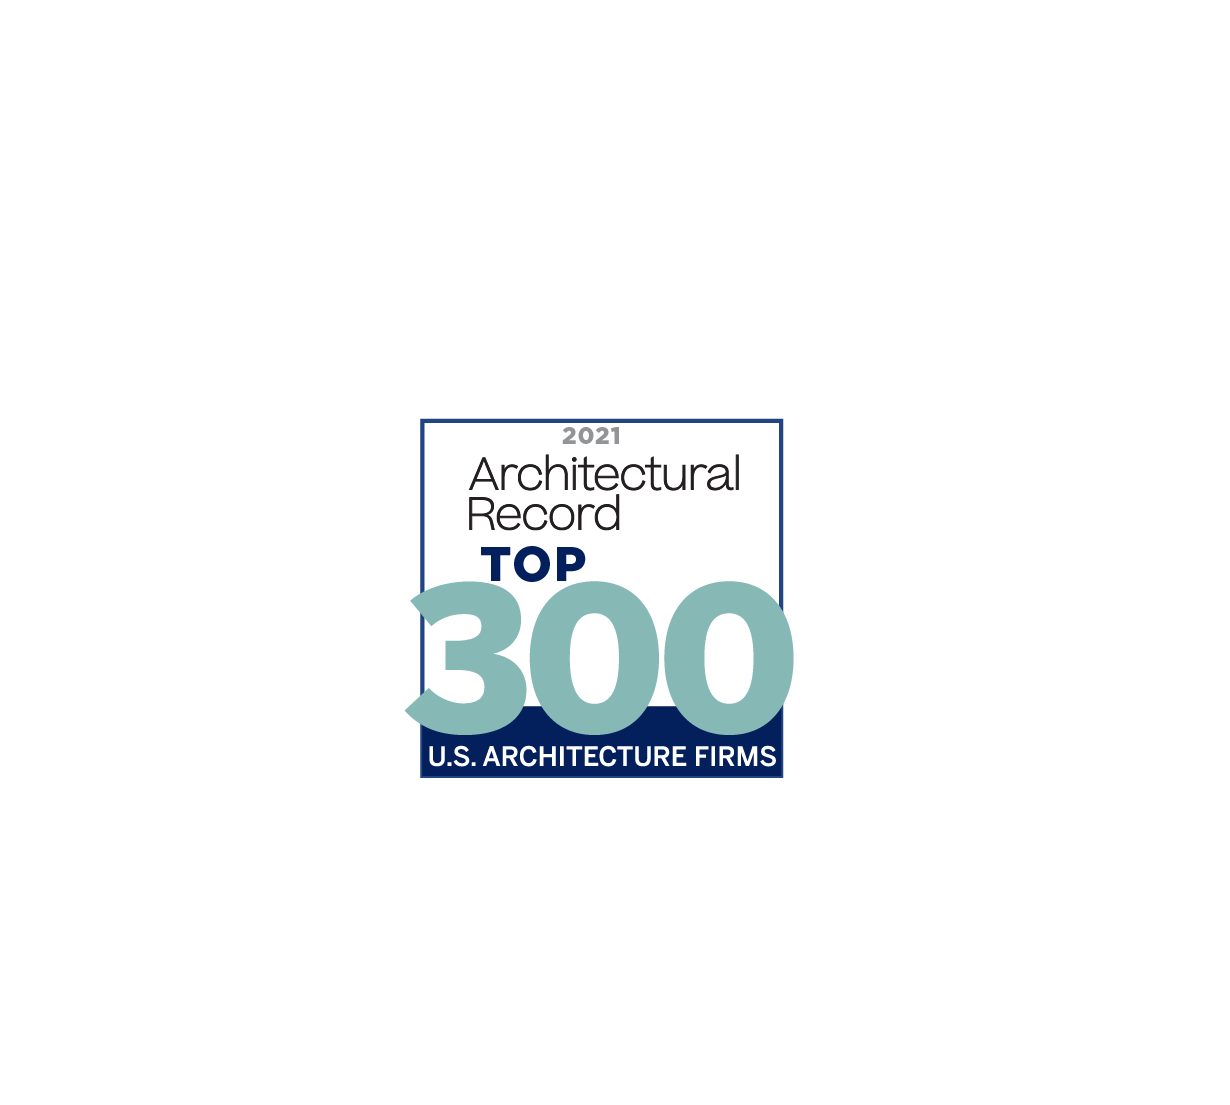 Architectural Record 2021 Top 300